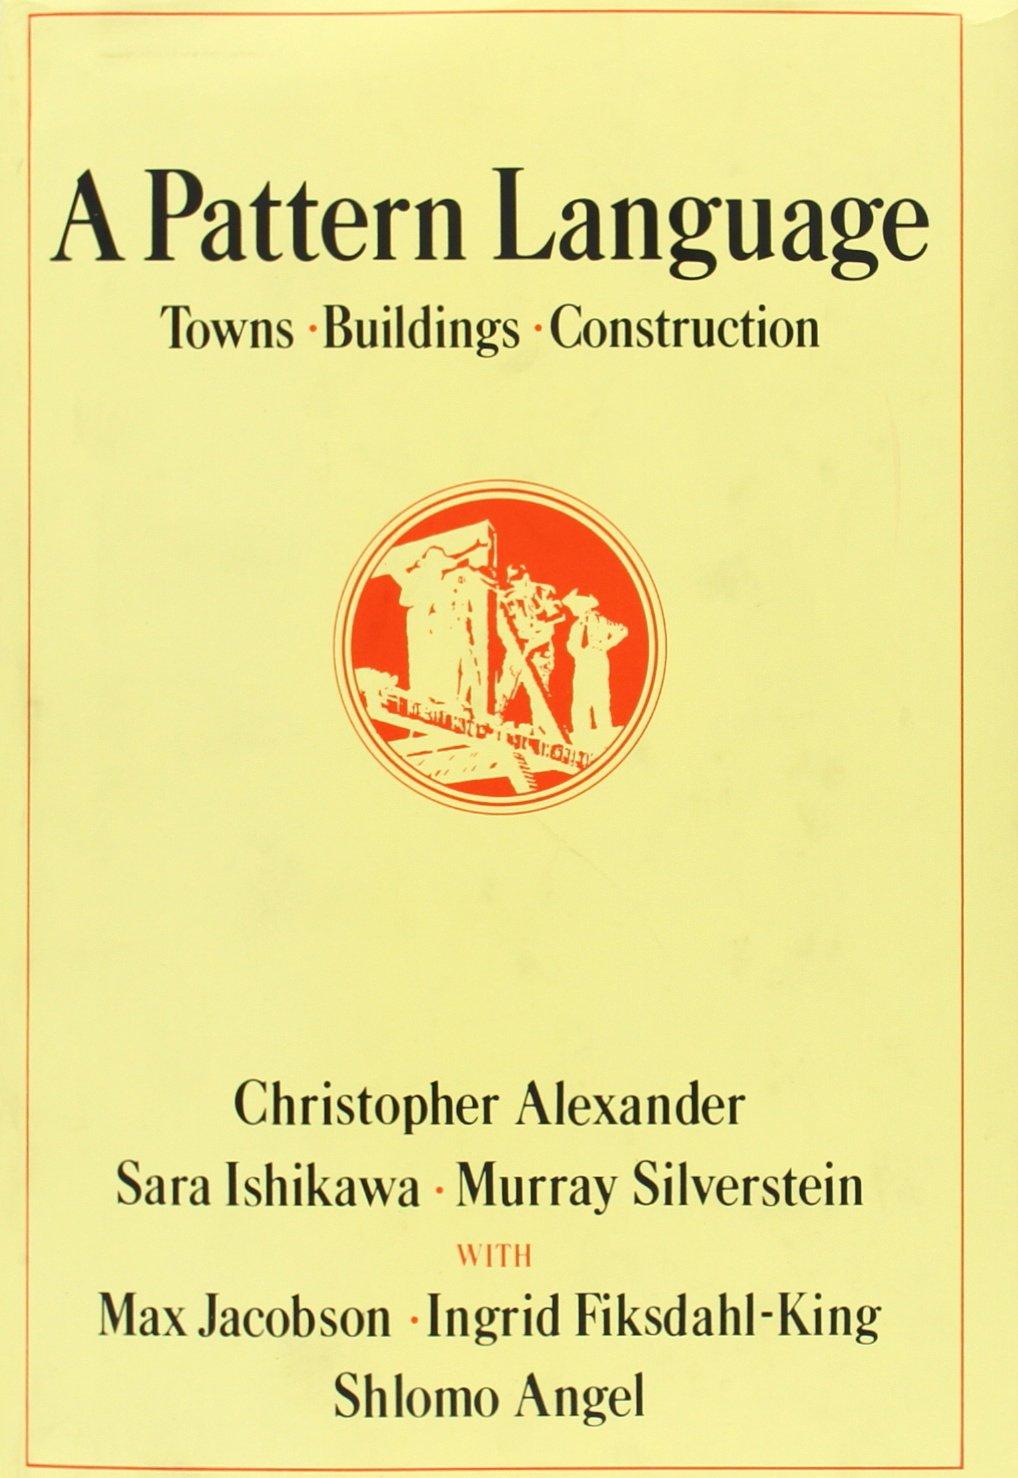 A Pattern Language ISBN-13 9780195019193